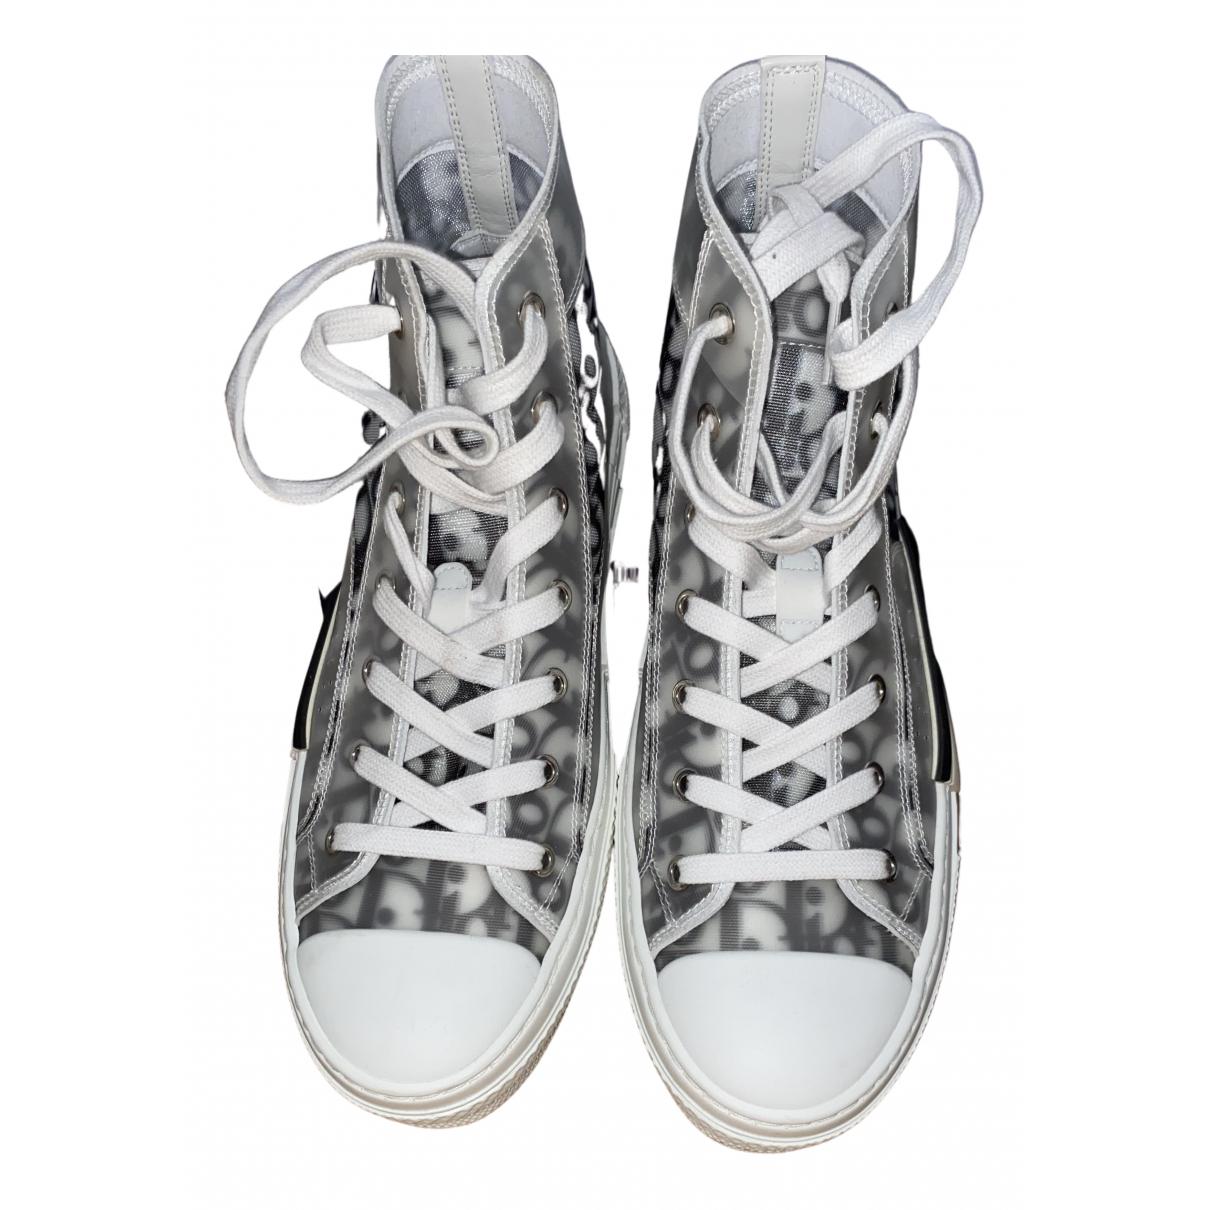 Dior Homme \N Sneakers in  Weiss Leinen